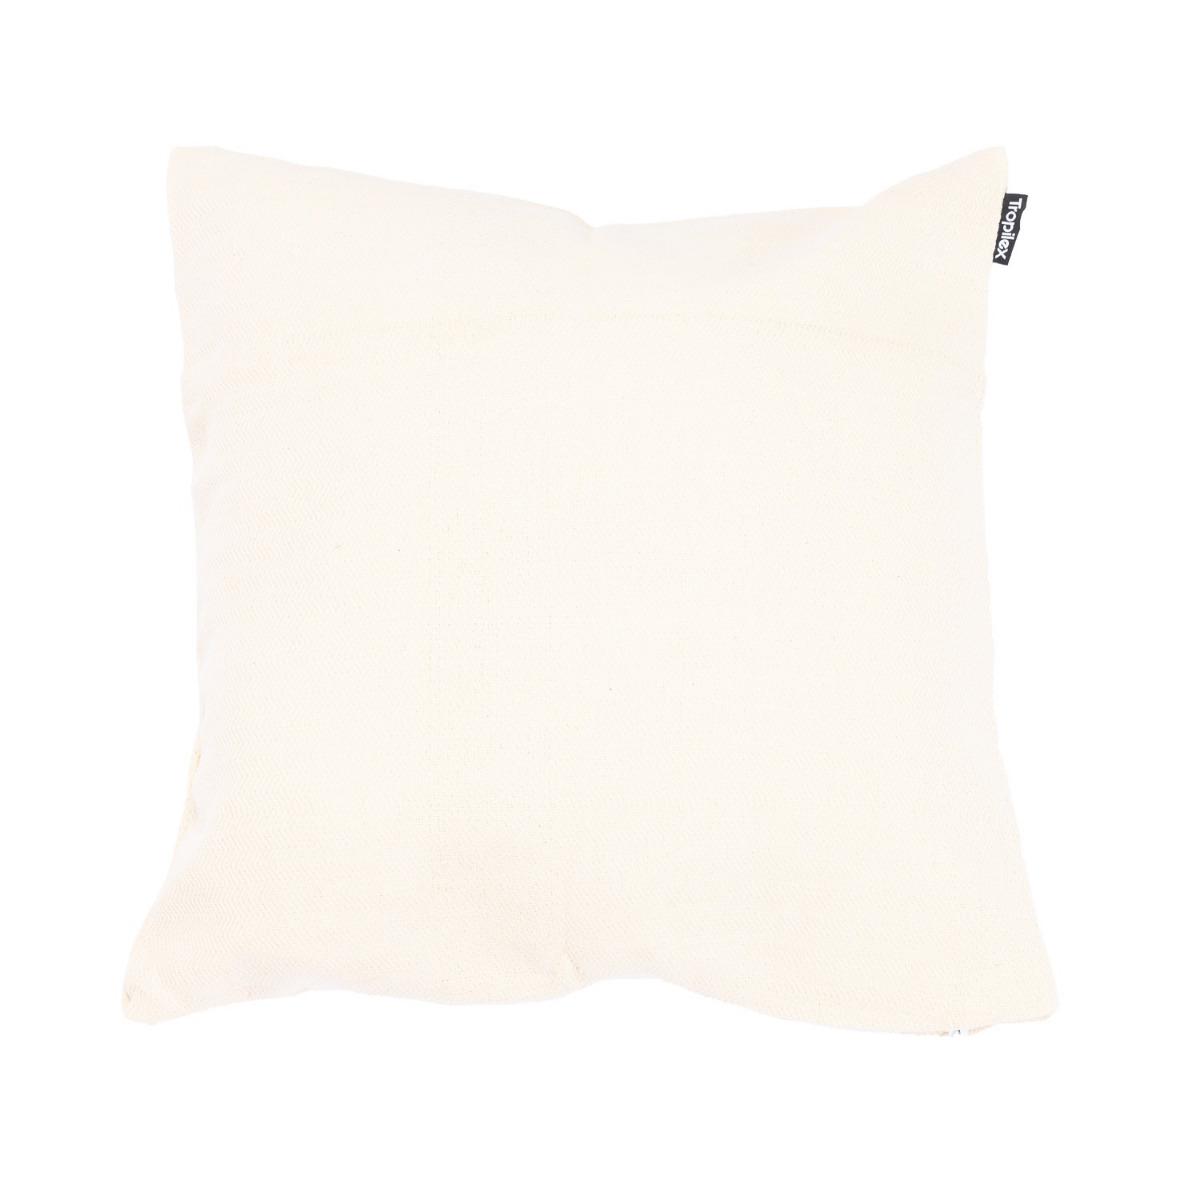 Kussen 'Comfort' White - Wit - Ecru - Tropilex �